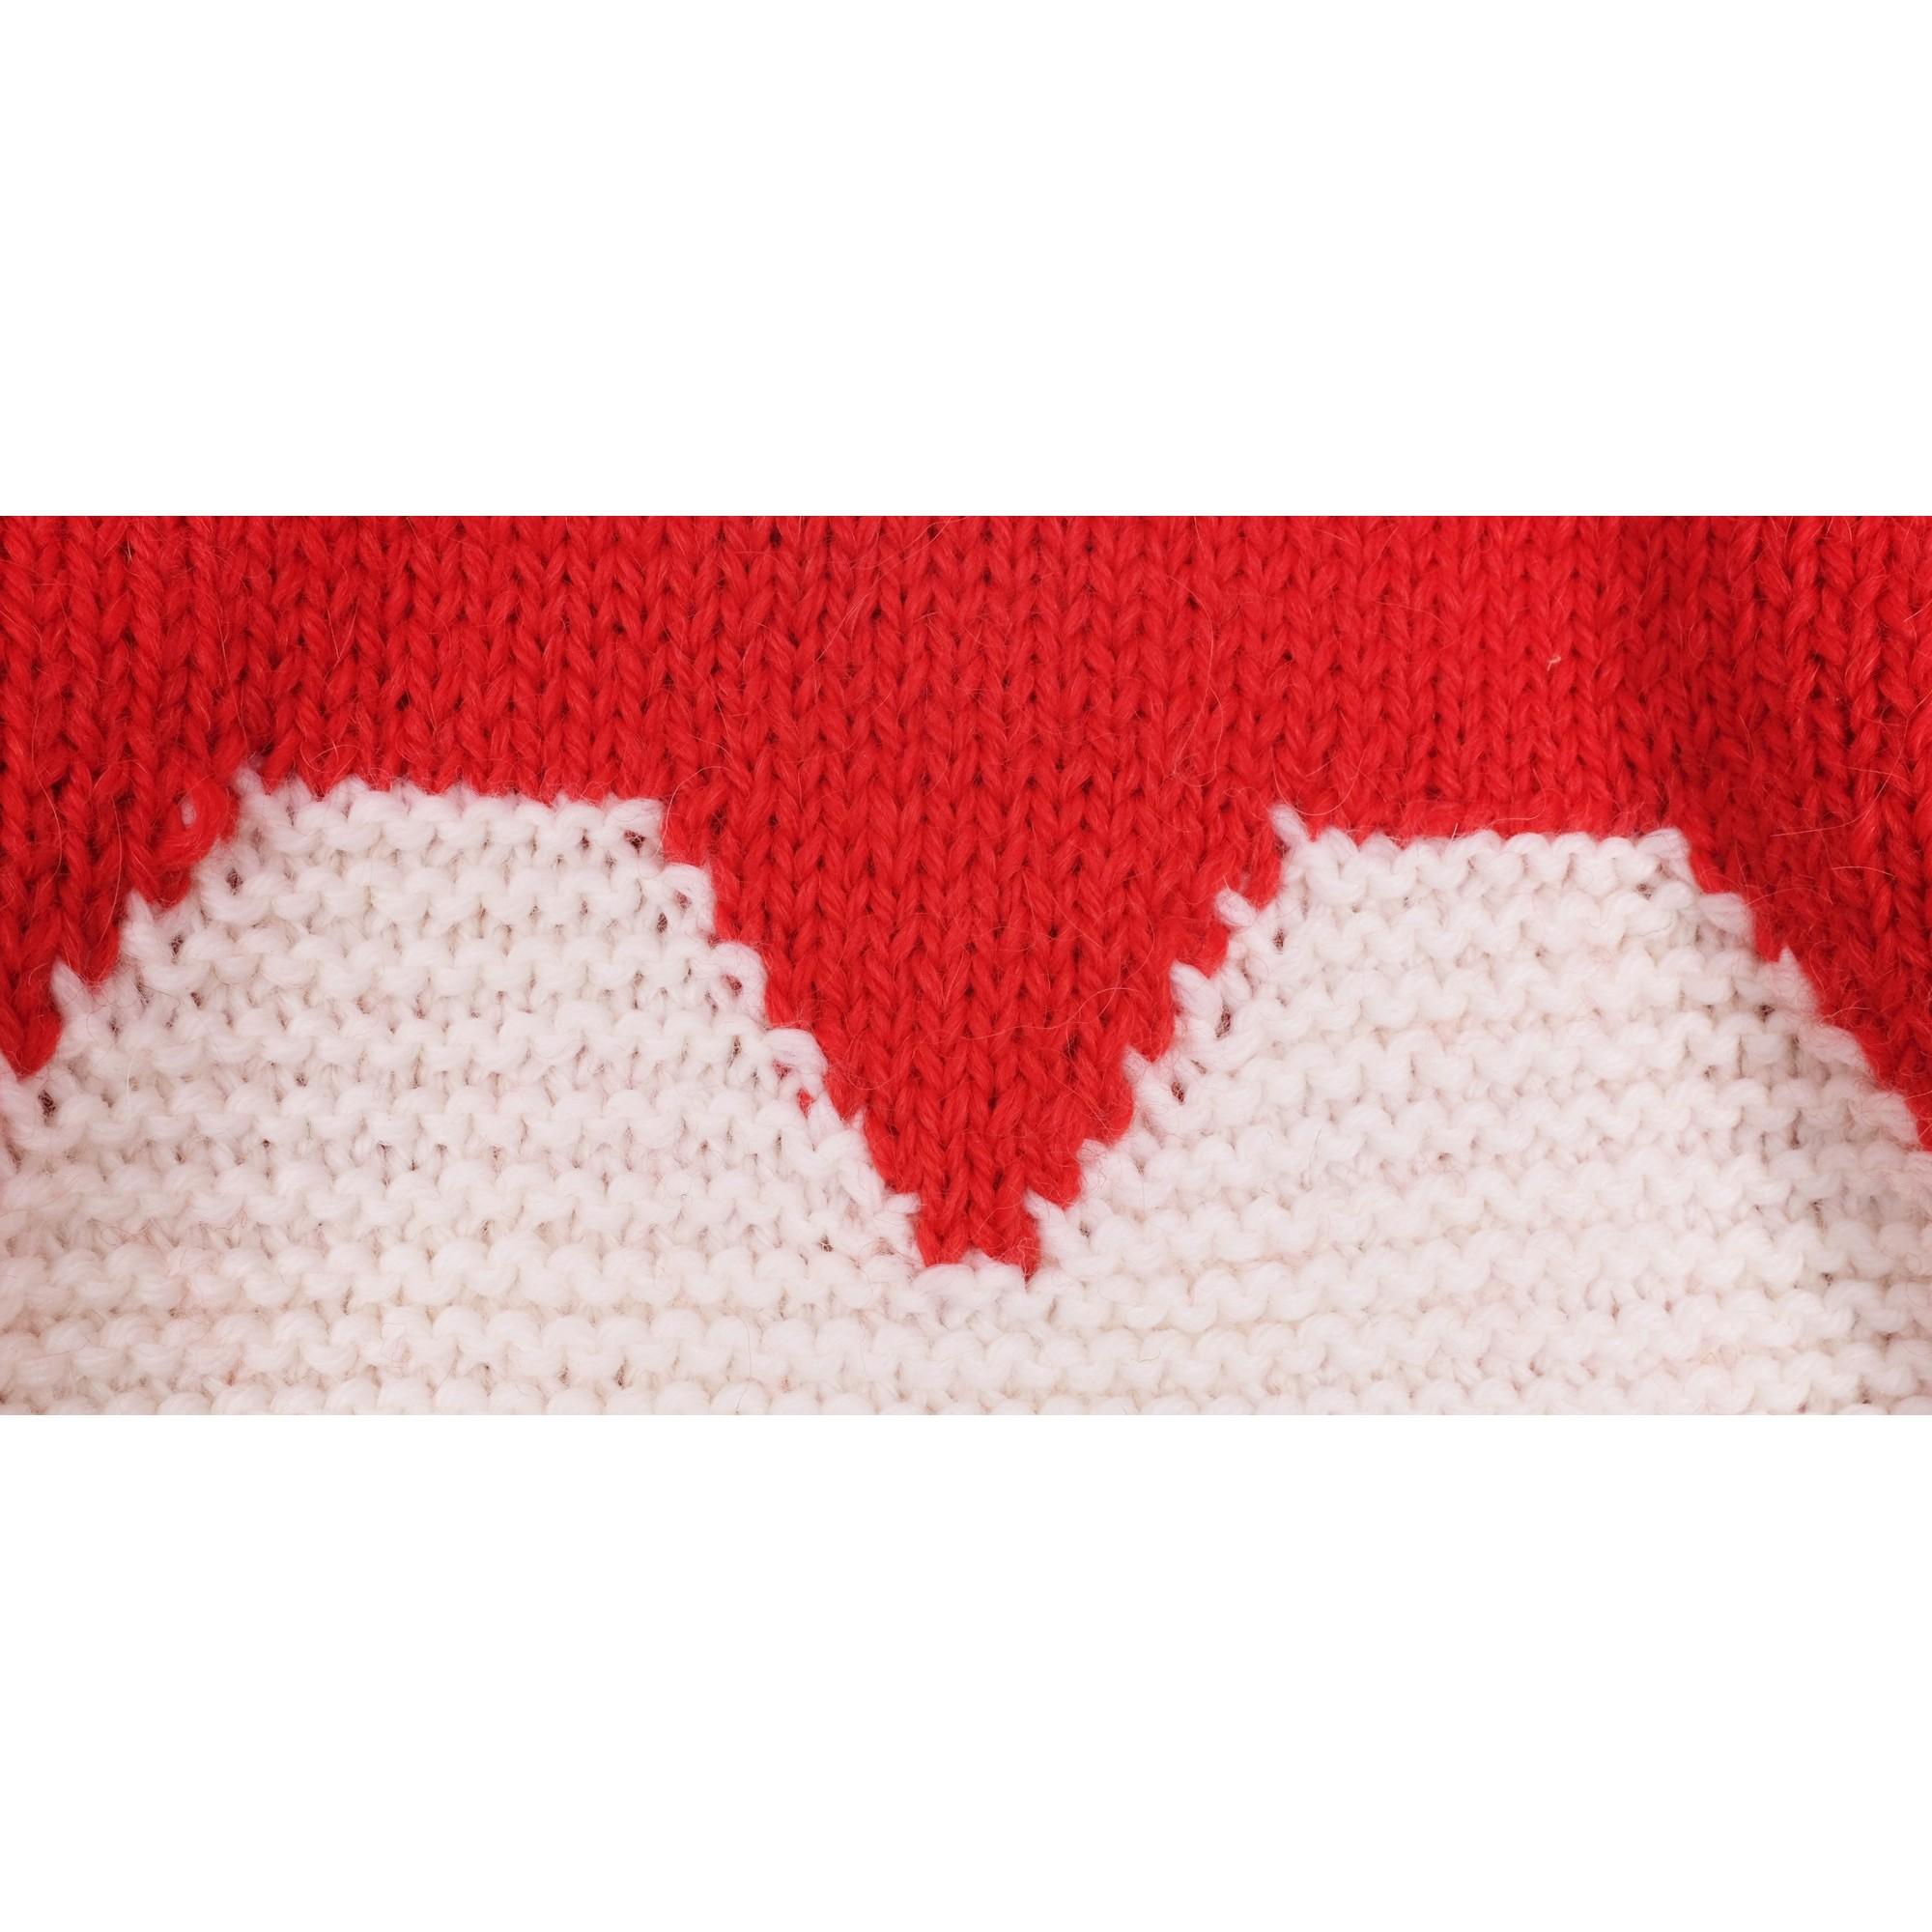 Pull Agénor laine alpaga rouge coeur blanc bébé détail 2